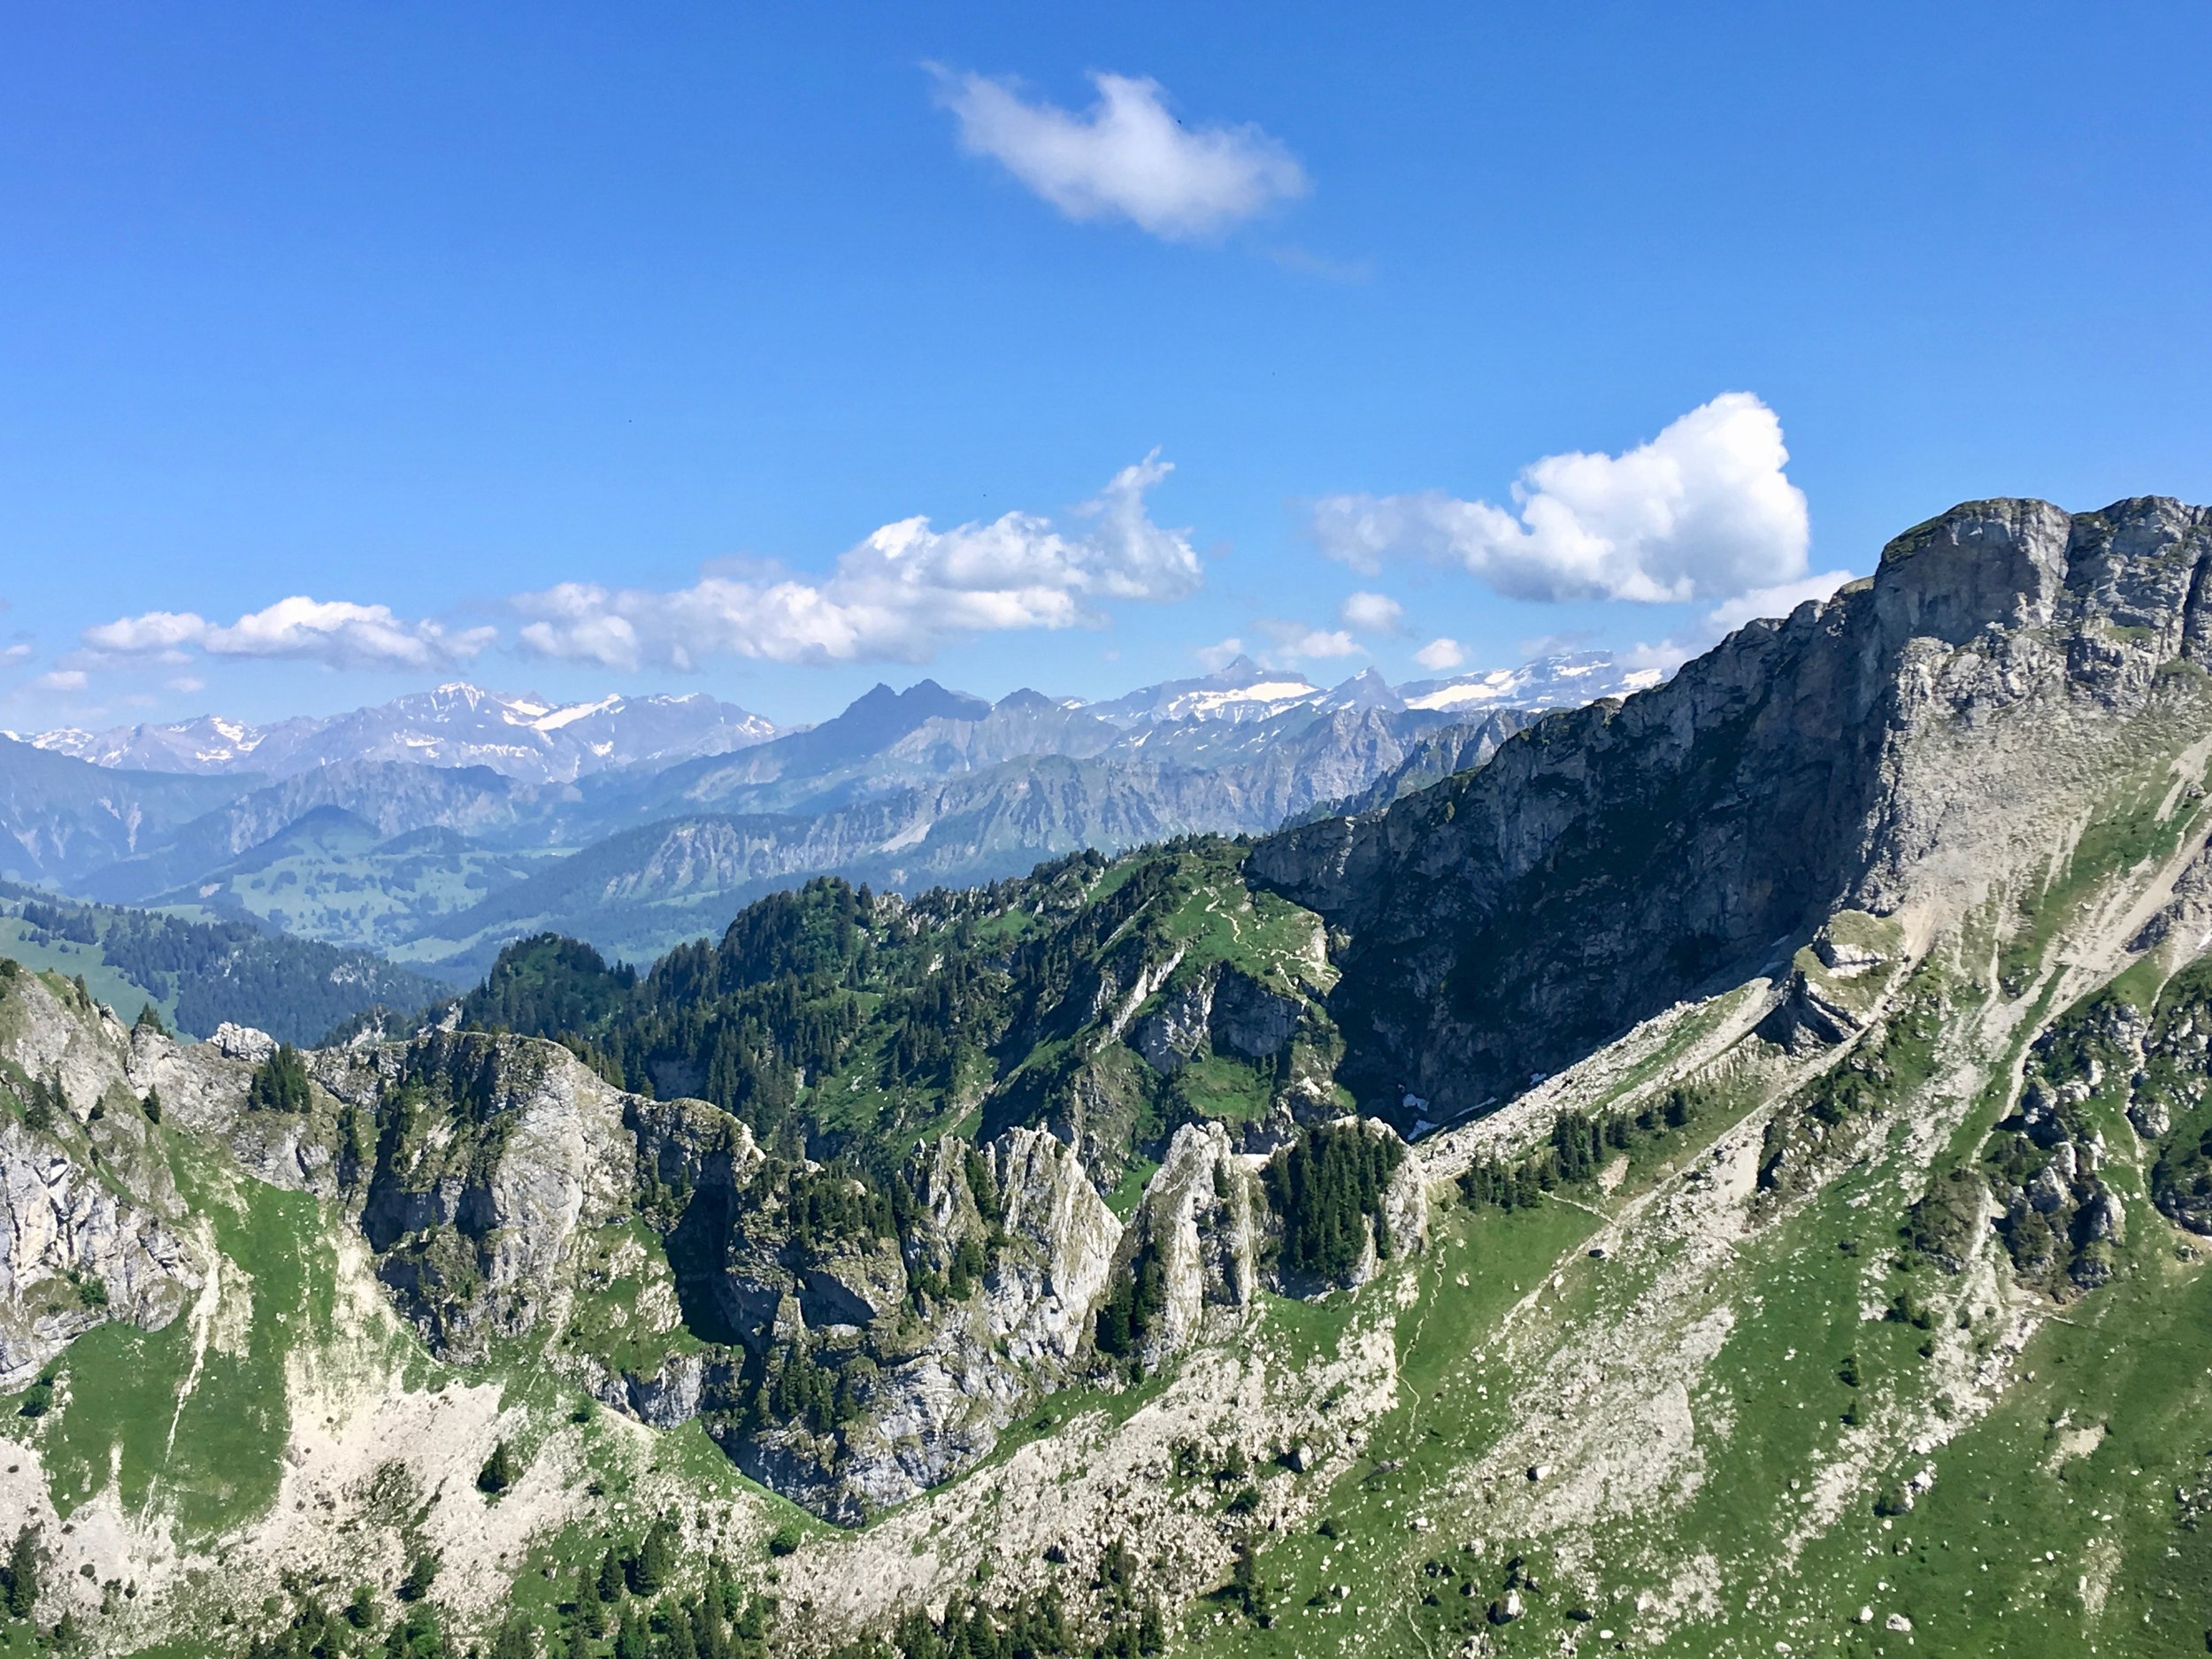 Rochers de Naye - Caux, Switzerland